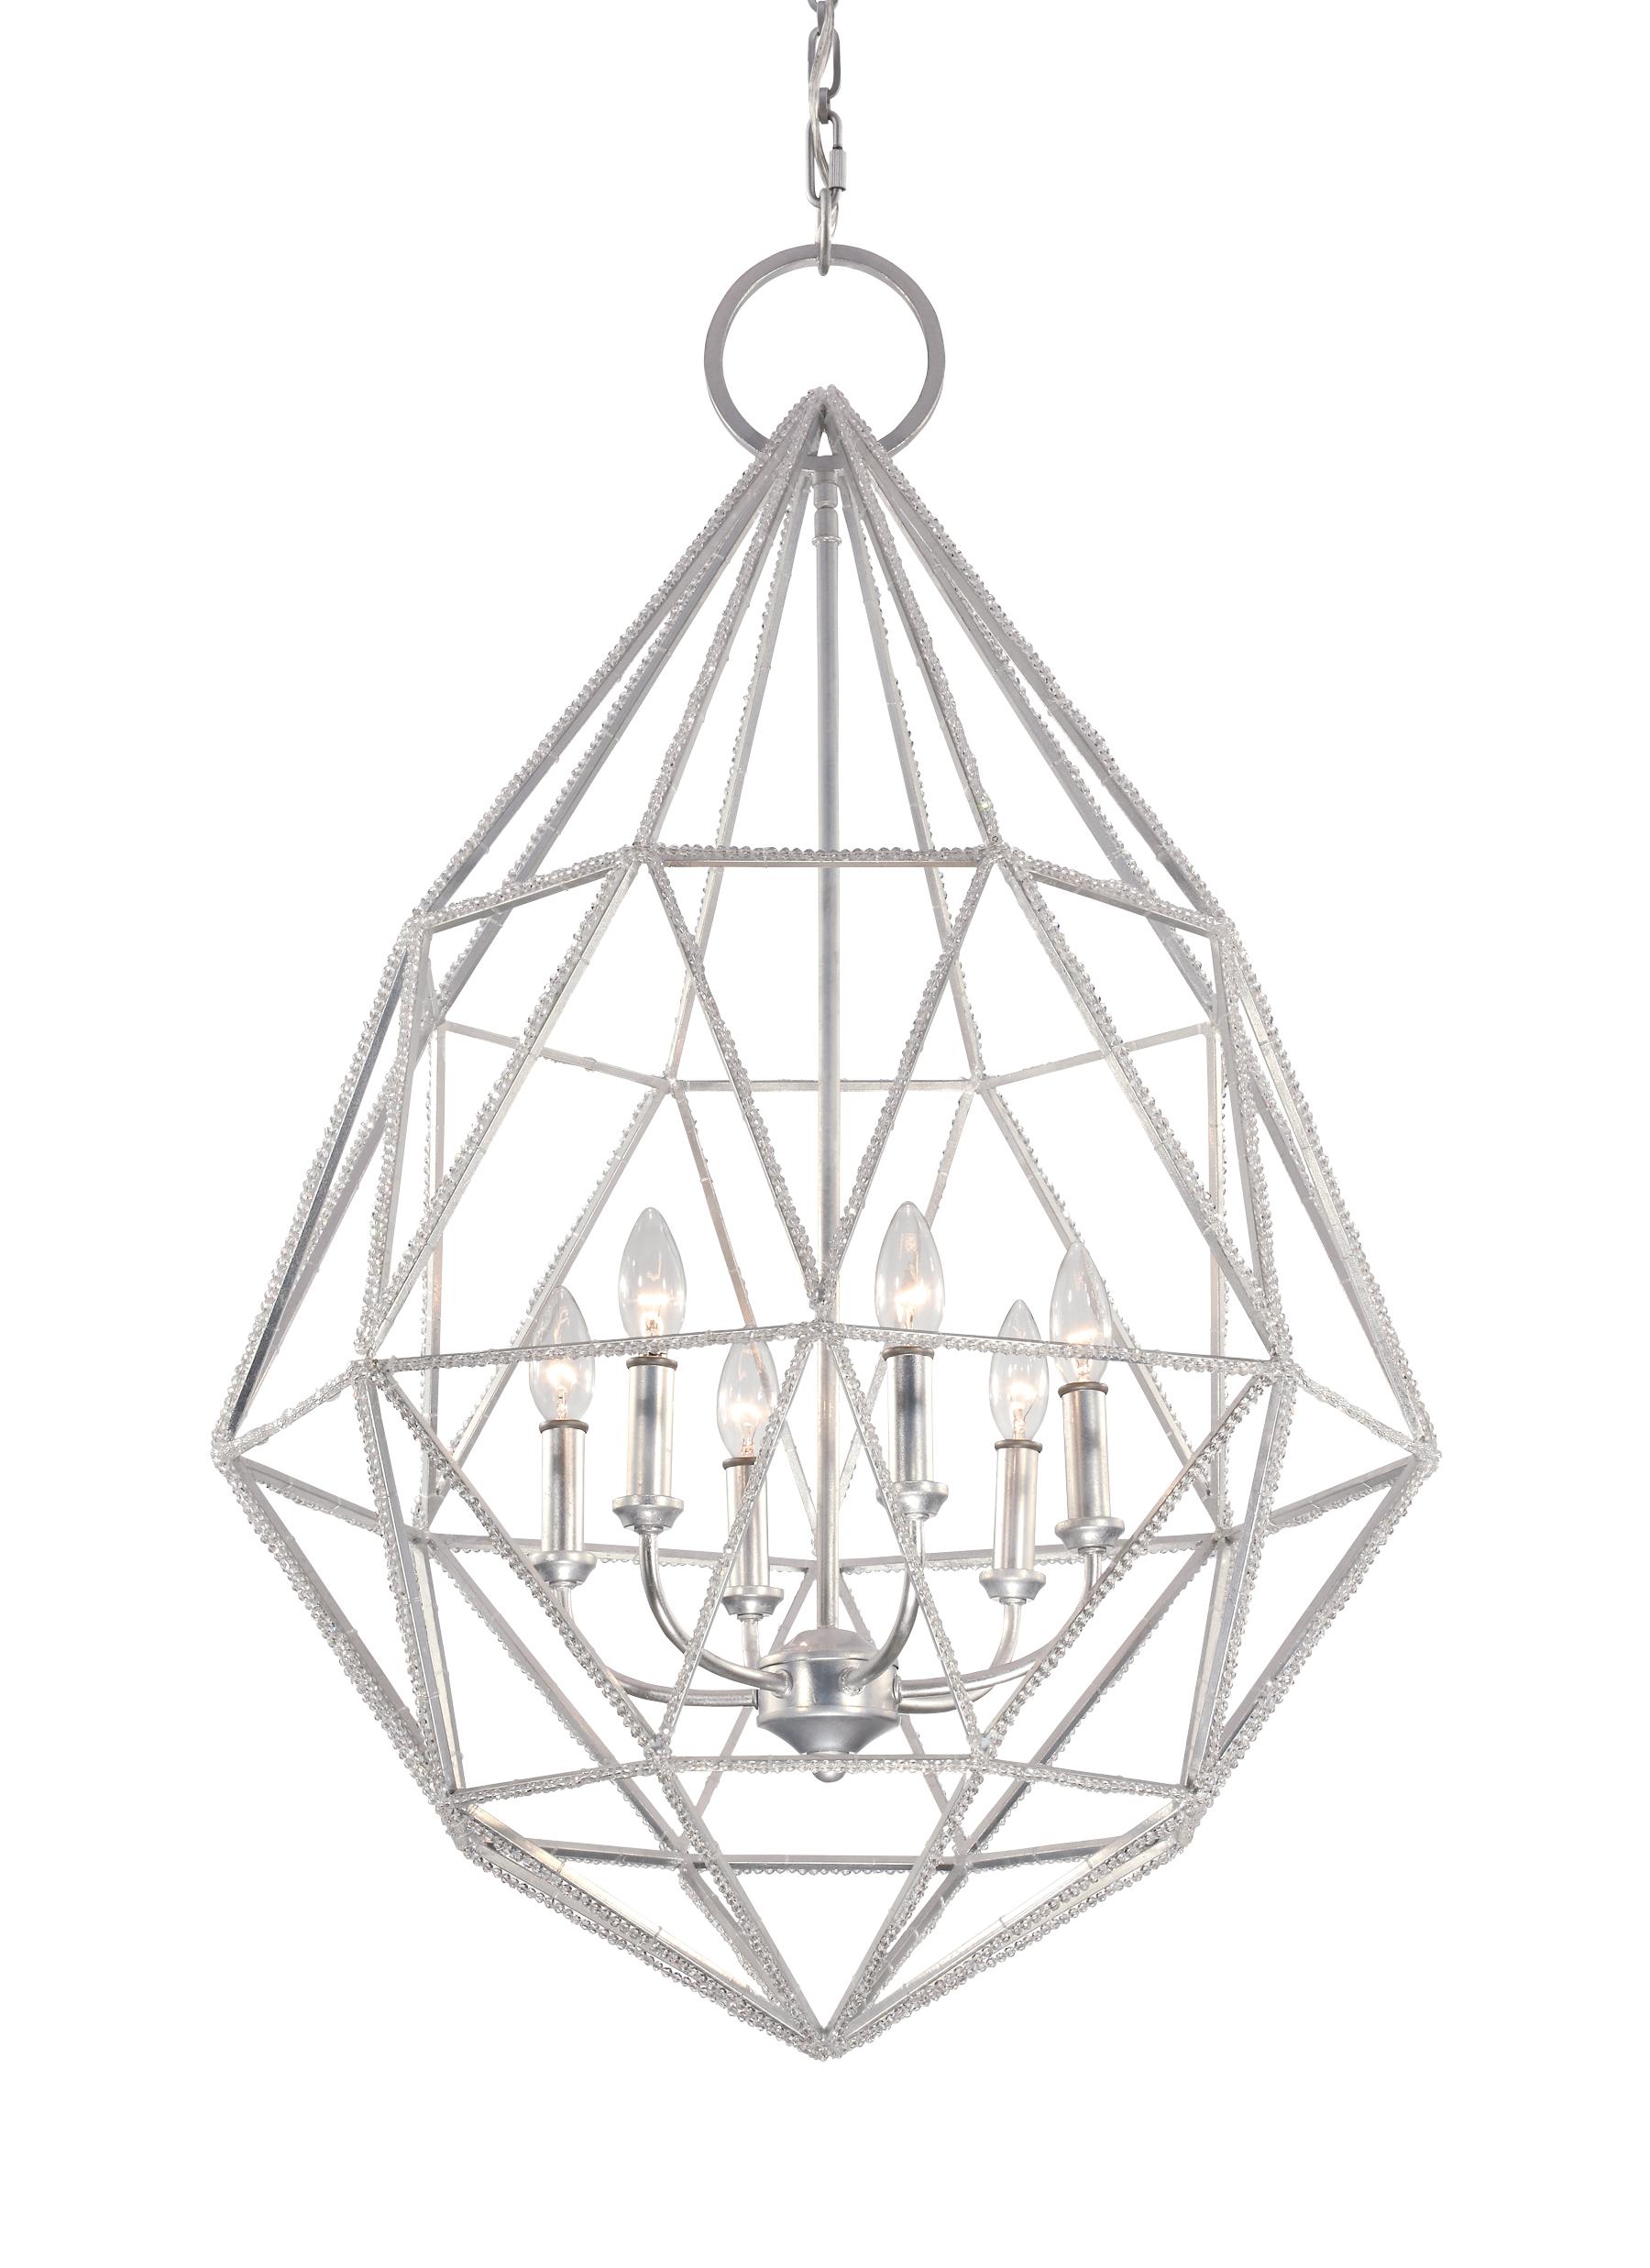 F29426slv6 light marquise chandeliersilver loading zoom aloadofball Choice Image